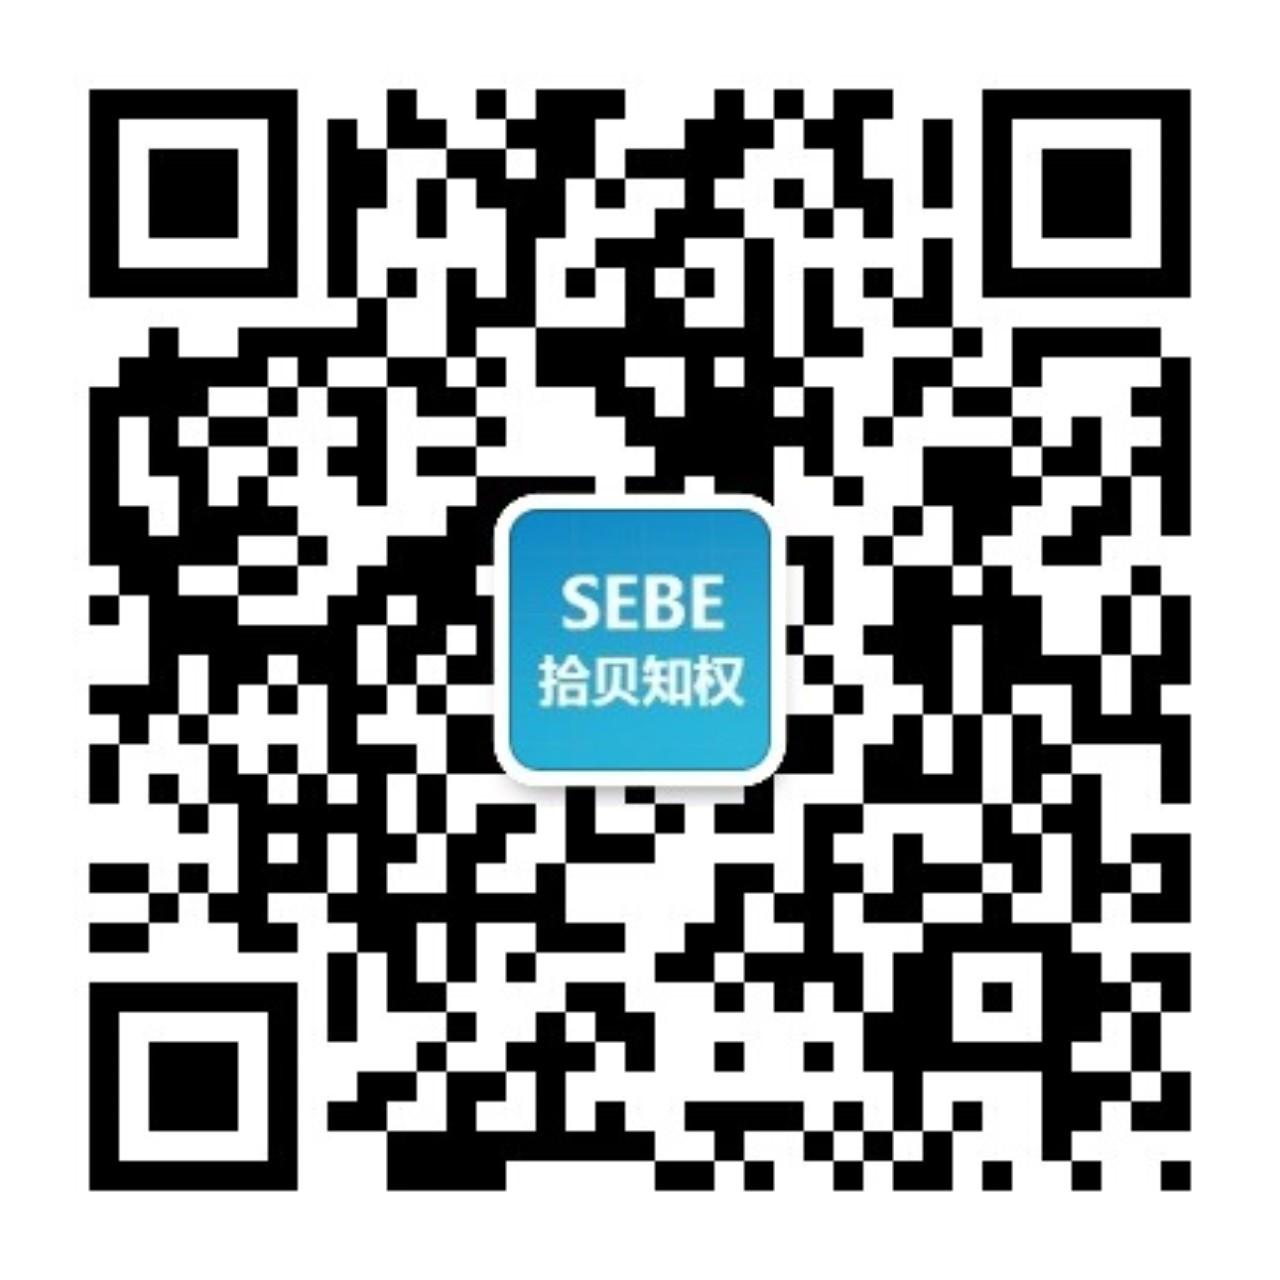 SEBE WeChat service platform